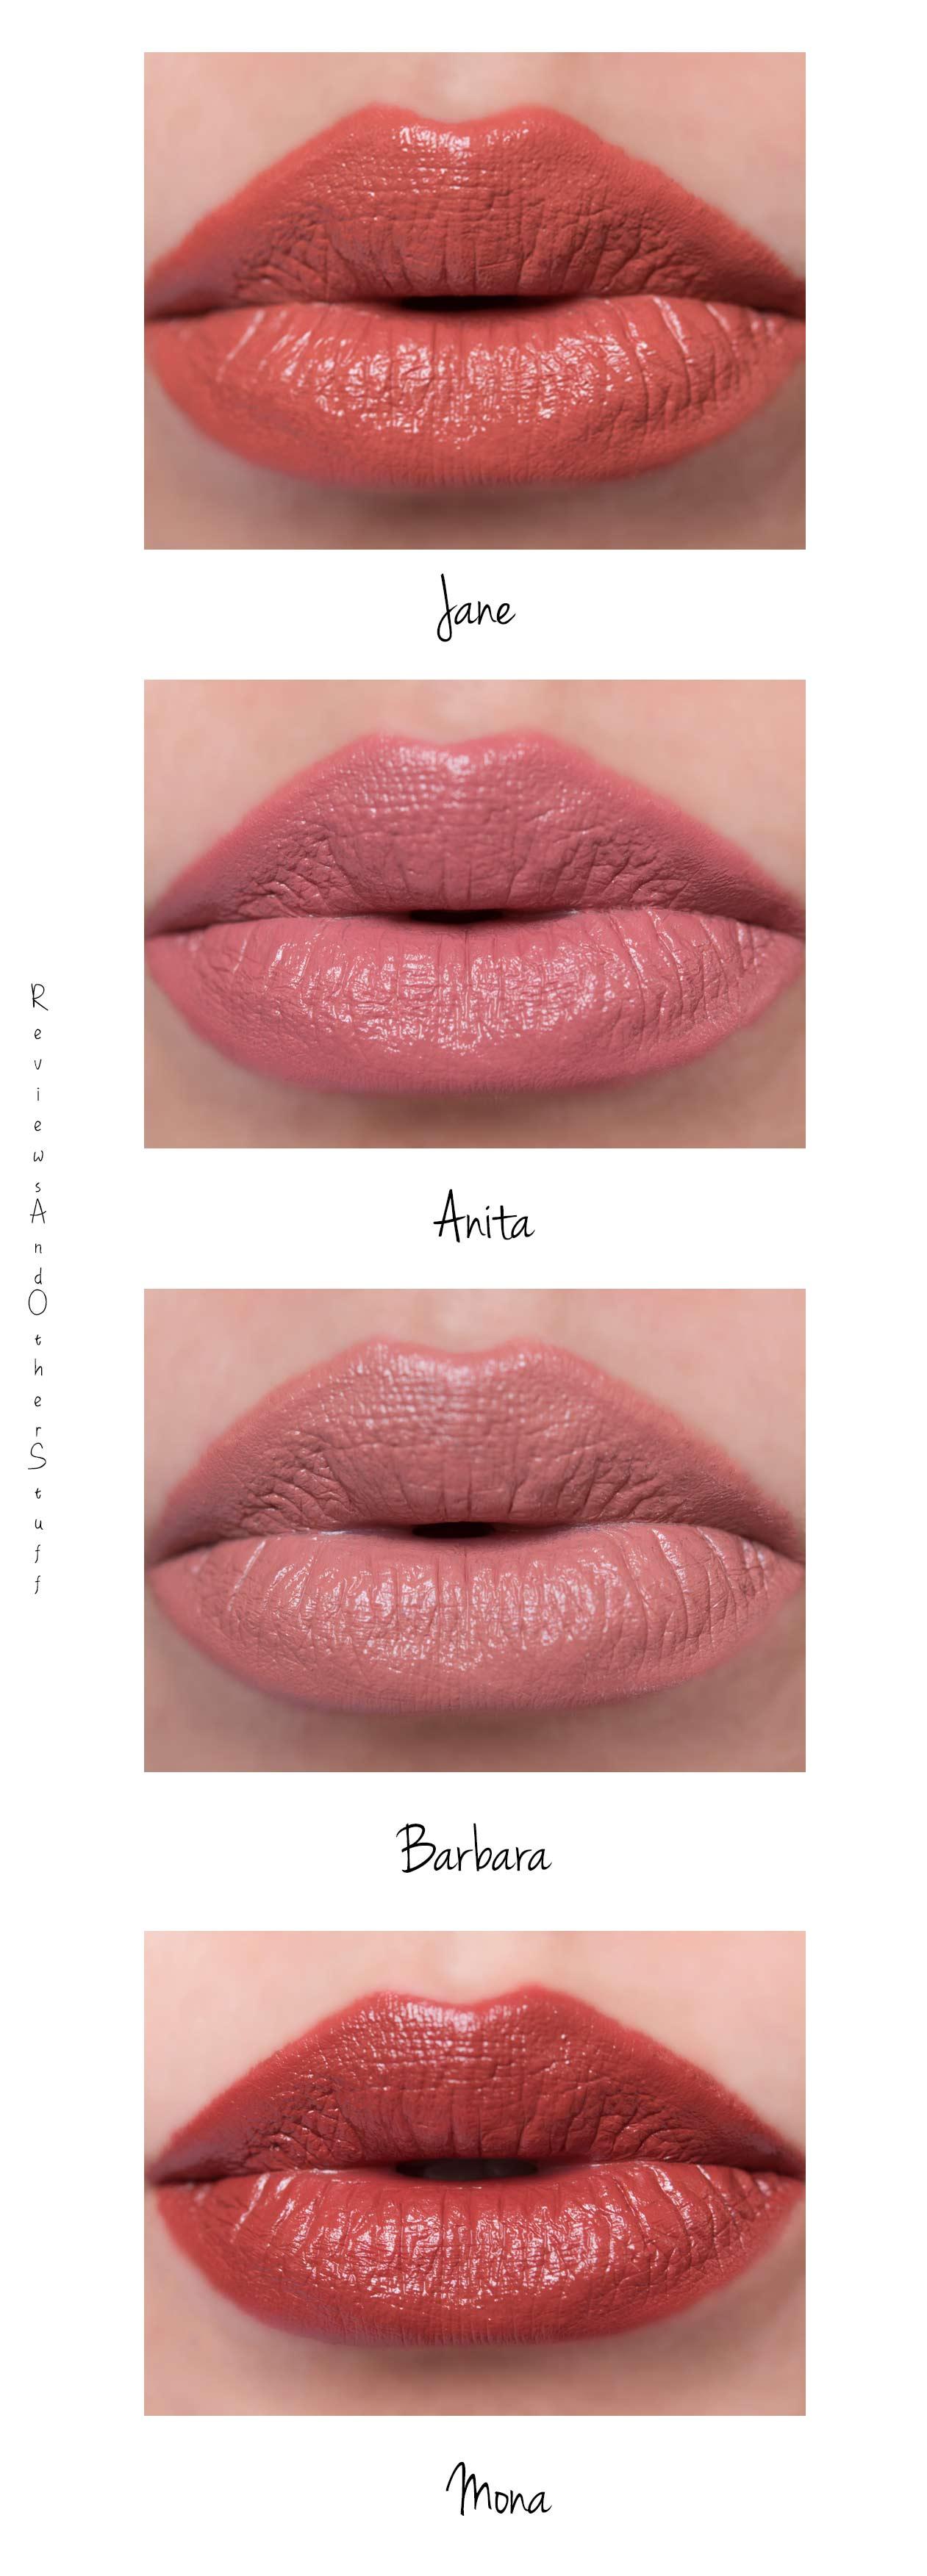 Populaire NARS Audacious Lipstick Review - AP13